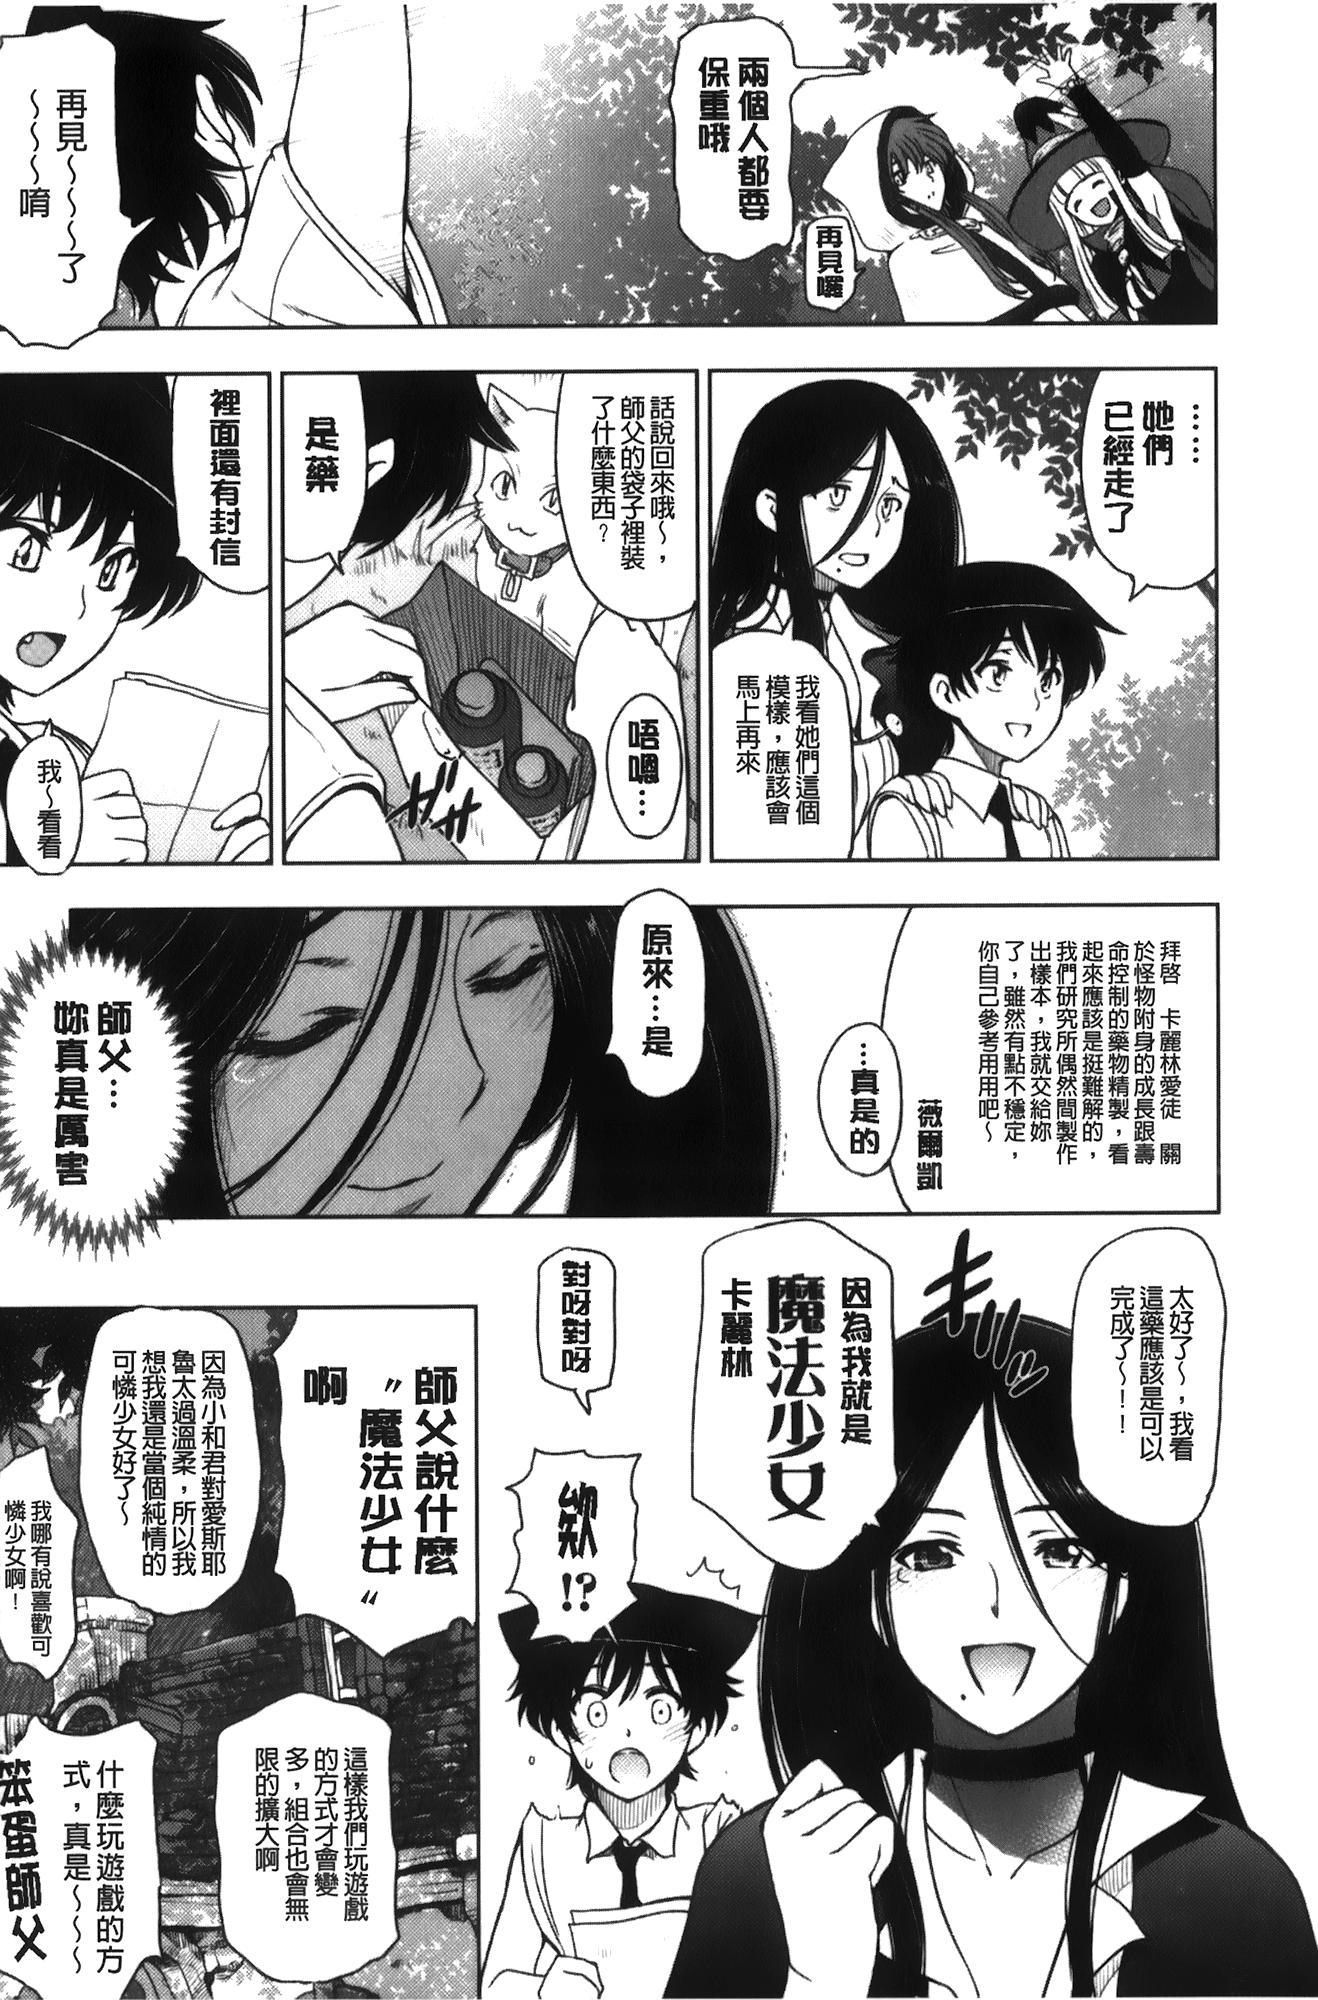 Majo × Shota ~ Genteiban | 魔女X小正太 限定版 213